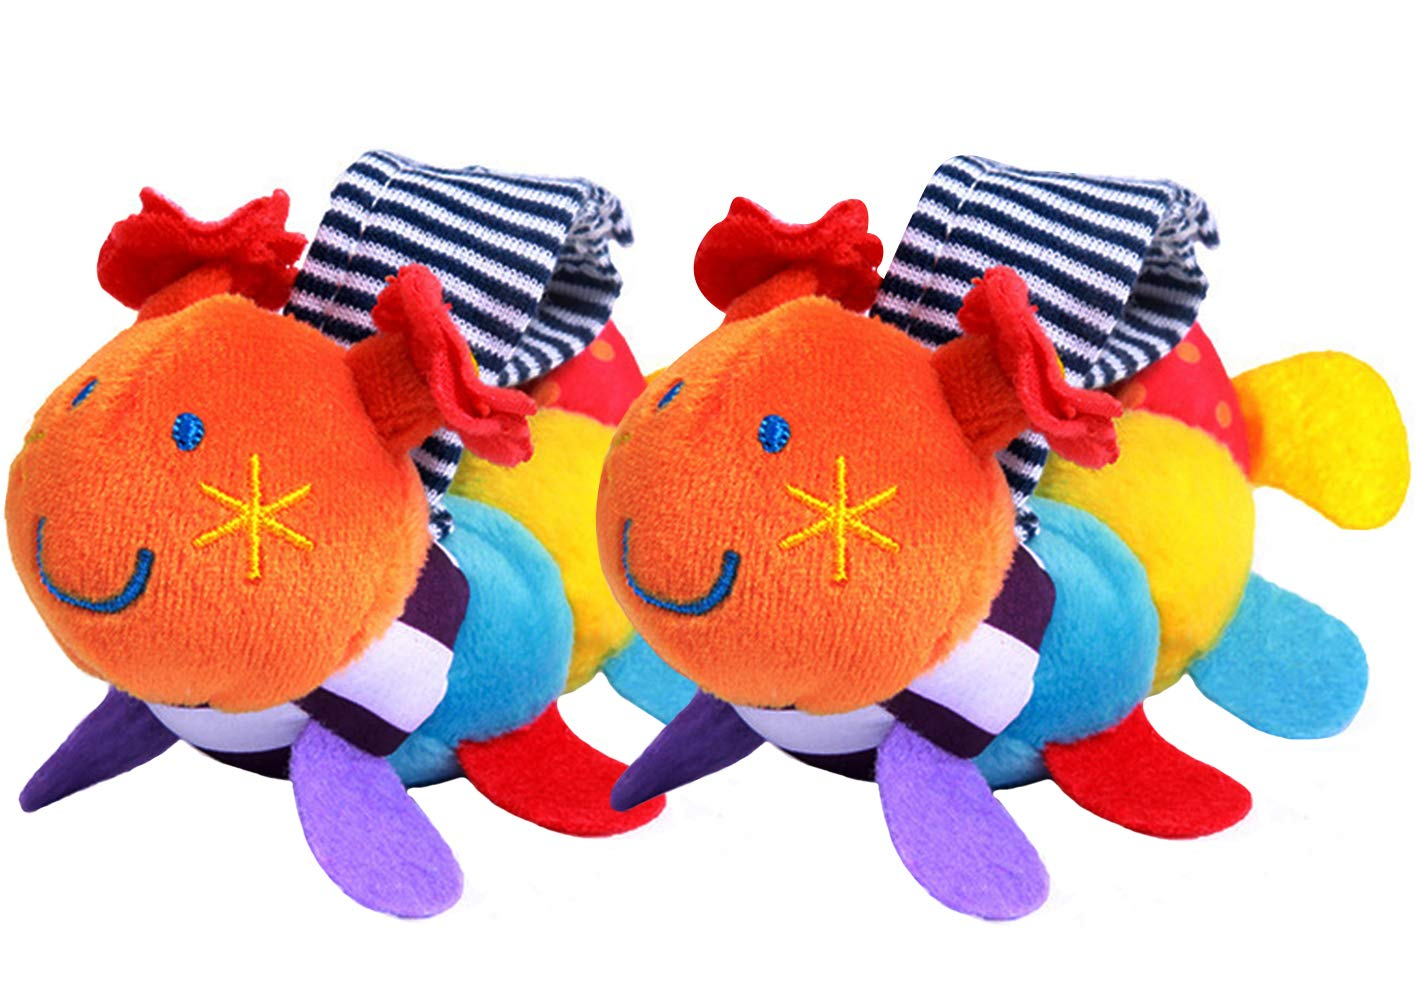 CC-US (1 Pair) Baby Soft Plush Caterpillar Wrist Rattle Infant Hand Bell Wristband Developmental Toy for Kids